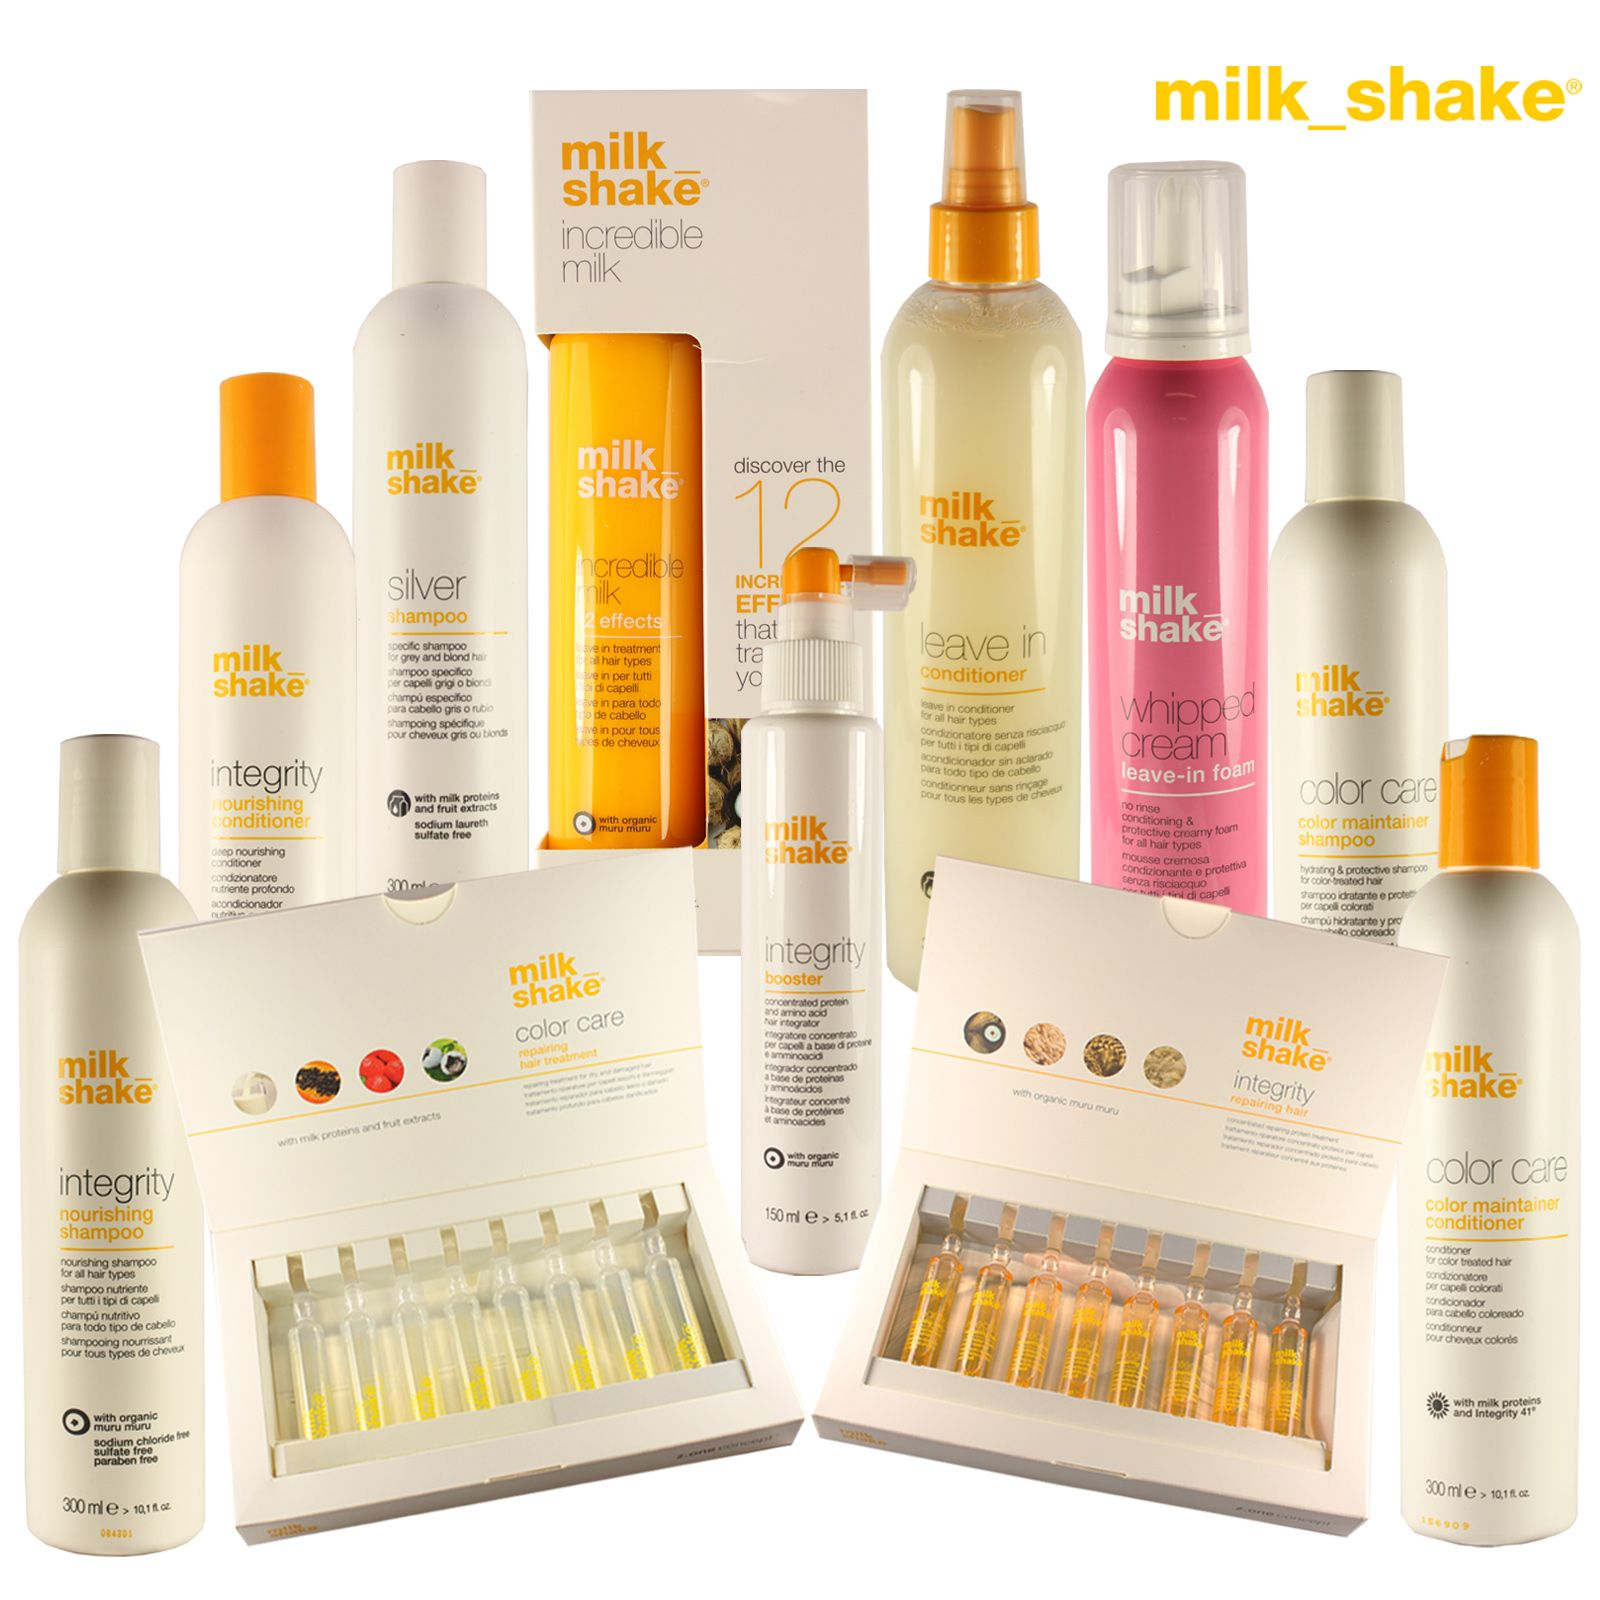 Pin By Erica Mclaurin On Mopheads Milkshake Hair Products Hair